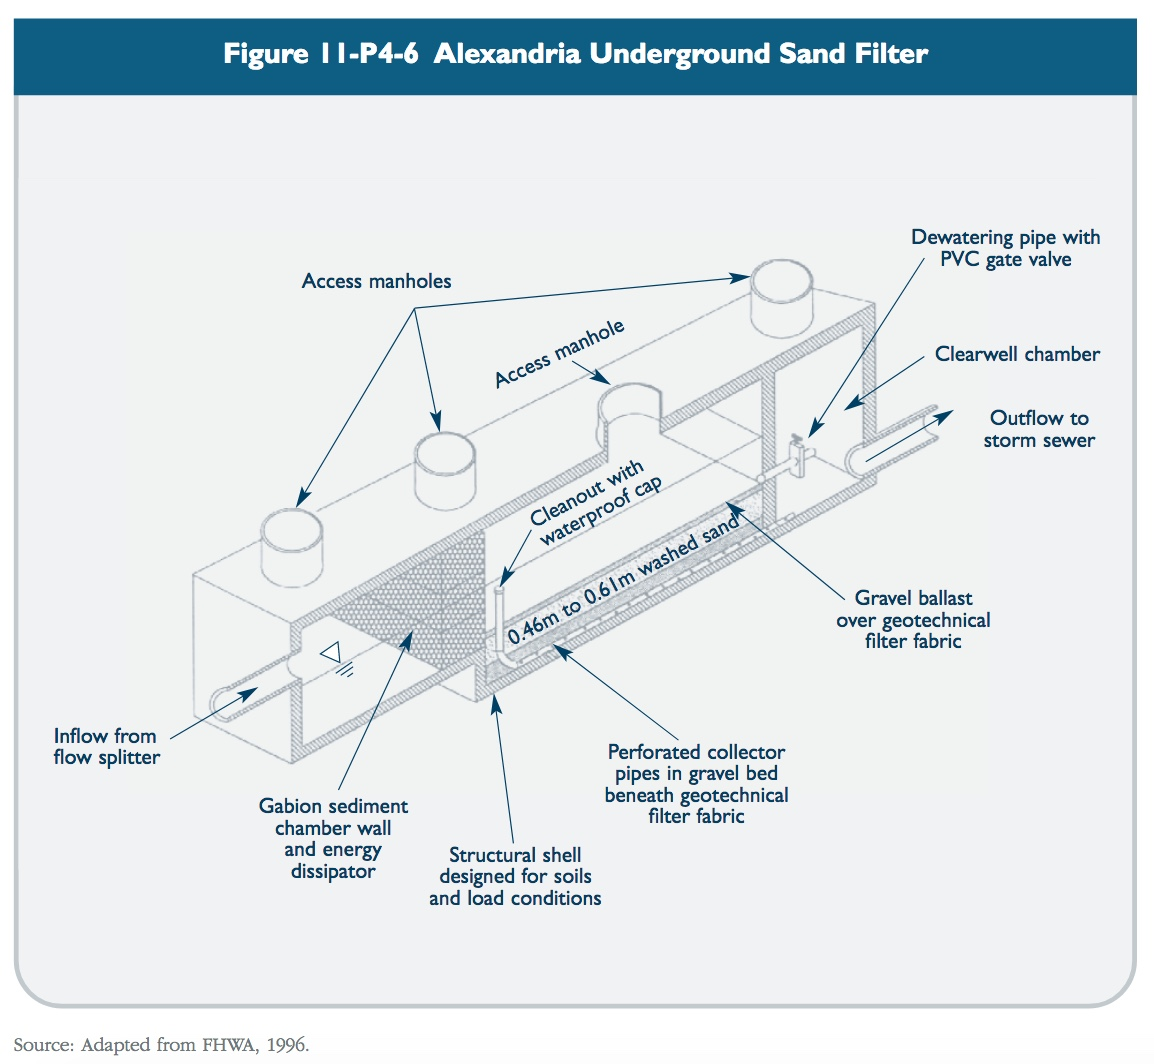 Figure 11-P4-6 Alexandria underground sand filter